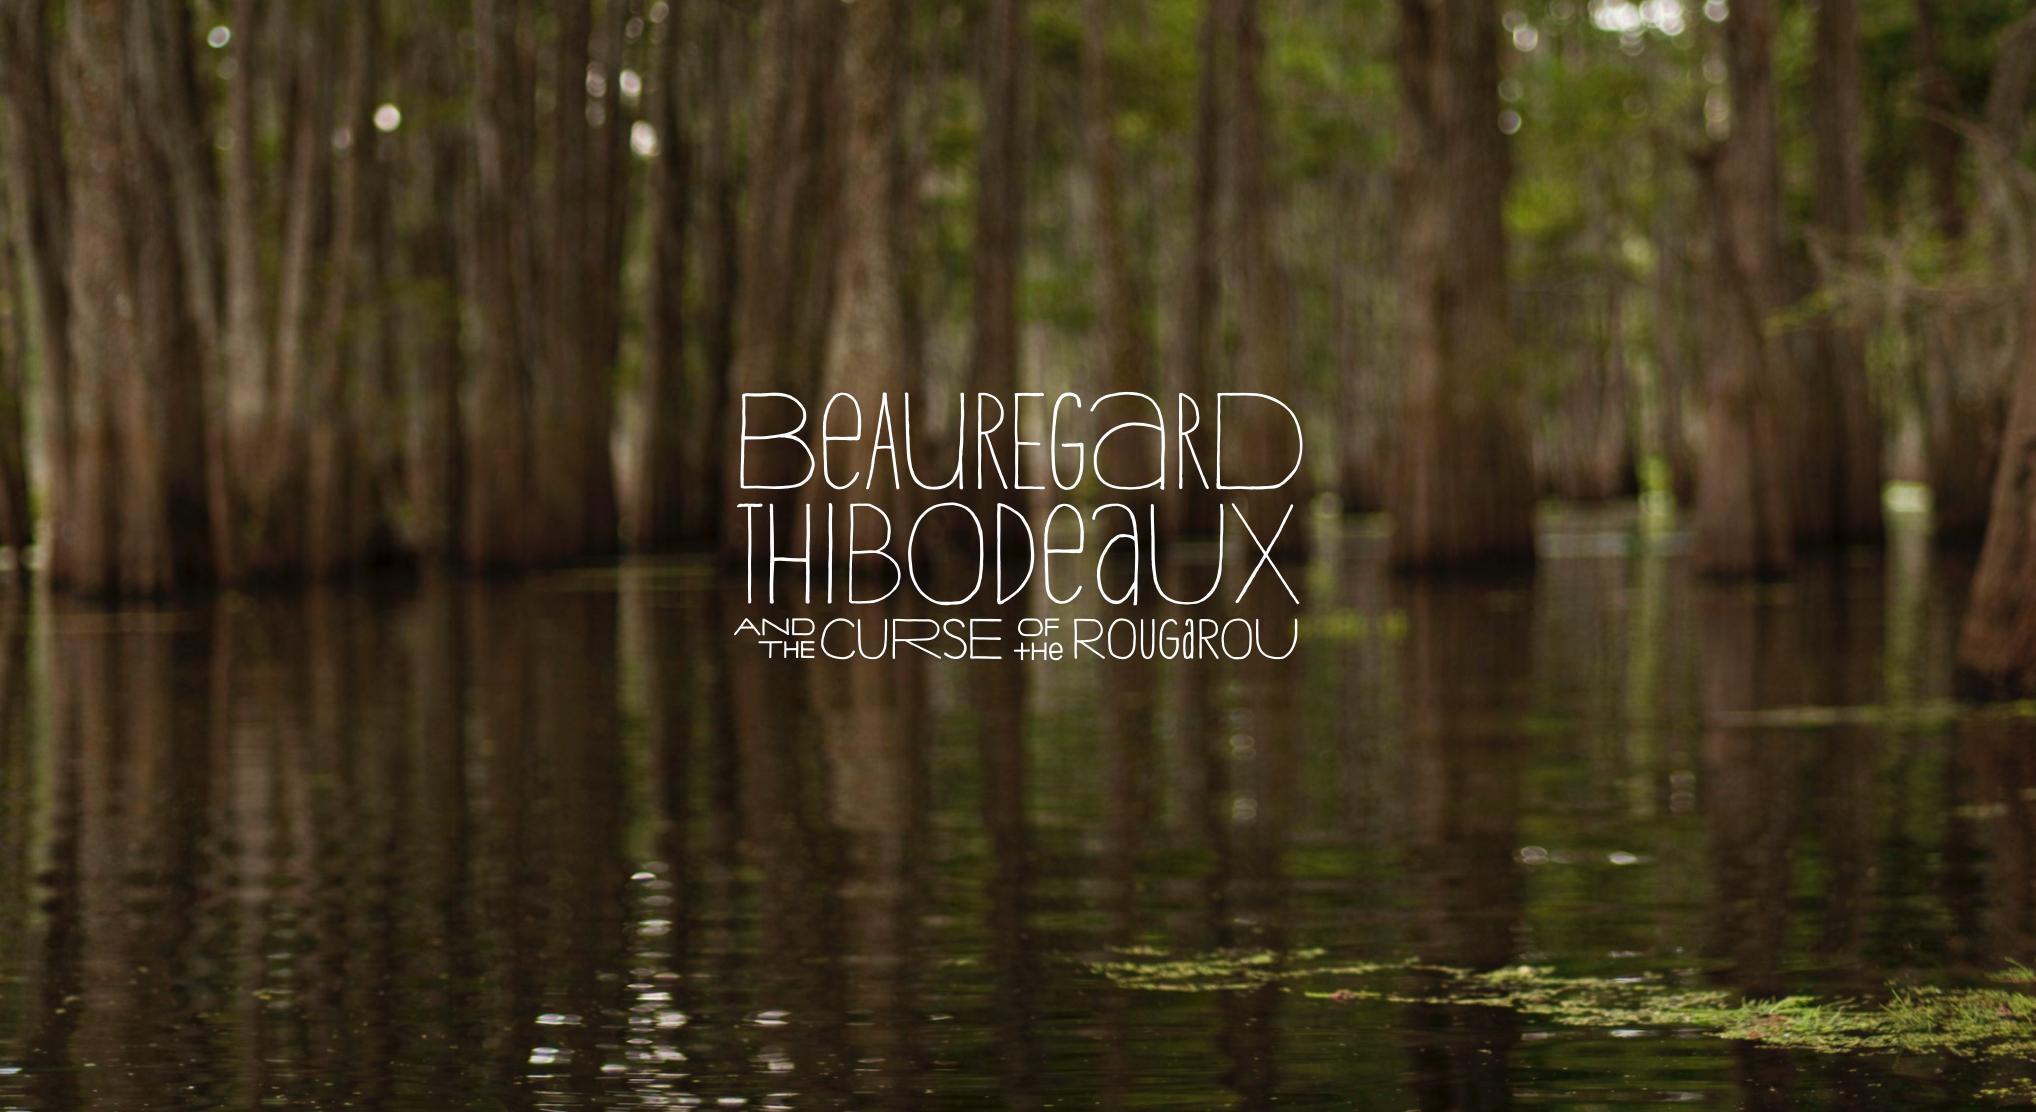 BEAUREGARD THIBODEAUX AND THE CURSE OF THE ROUGAROU